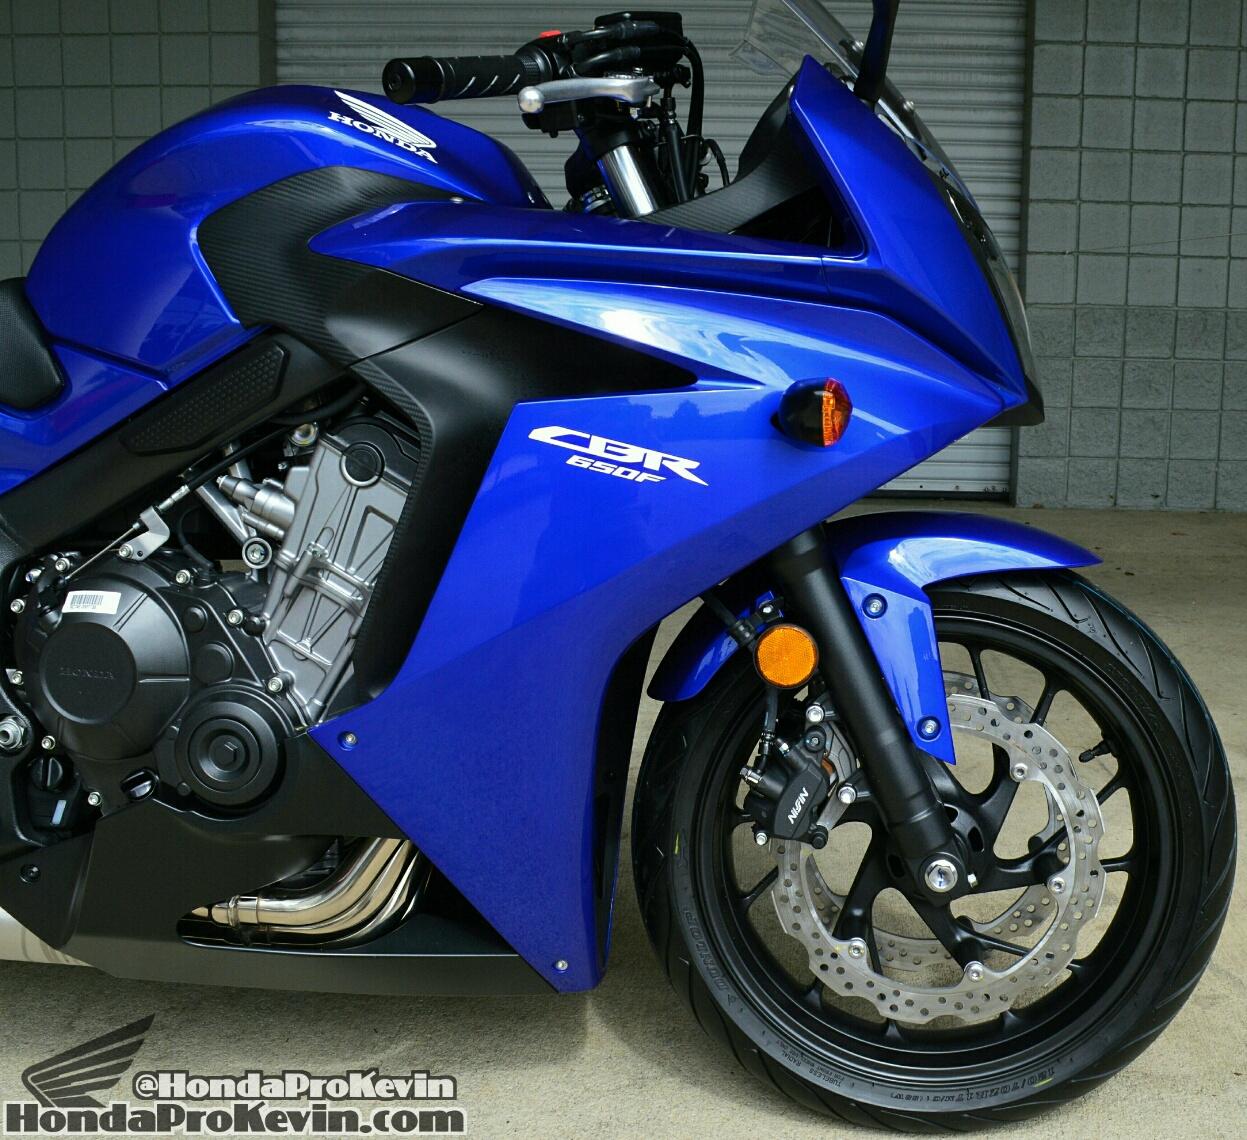 Honda cbr 2014 sports super sports bike photo - 2015 Honda Cbr650f Candy Blue Review Specs Cbr600rr Cbr500r Sportbike Models